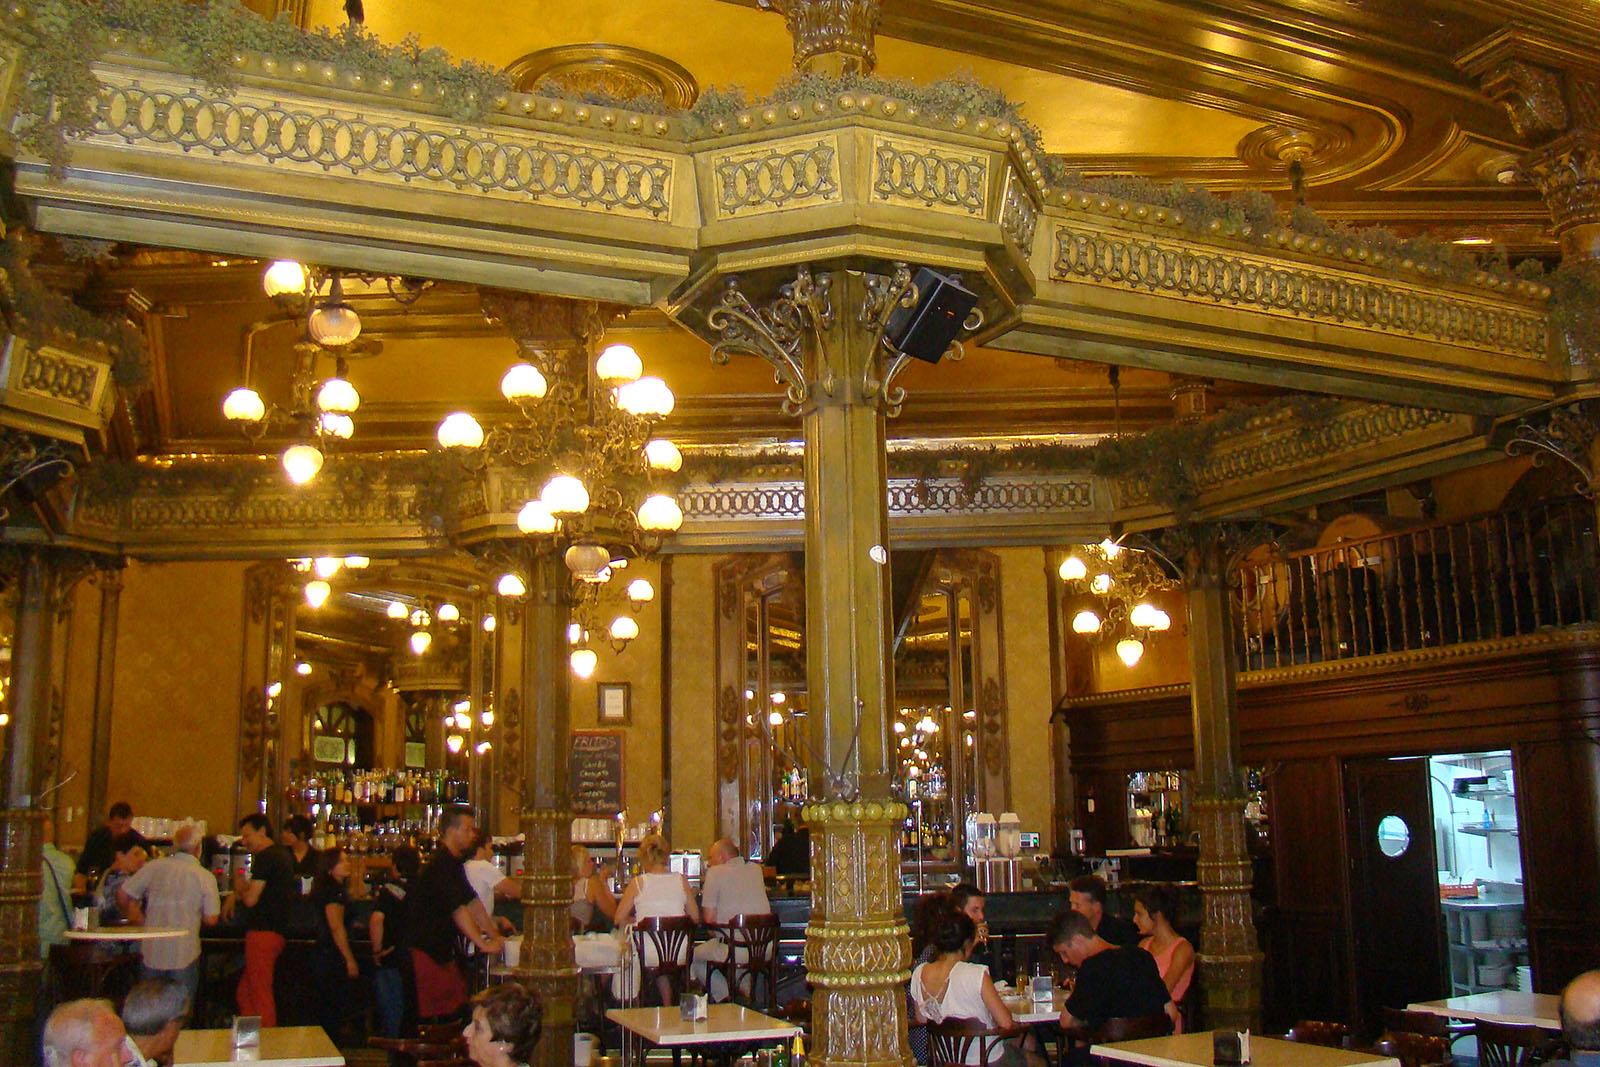 IRUNA CAFE